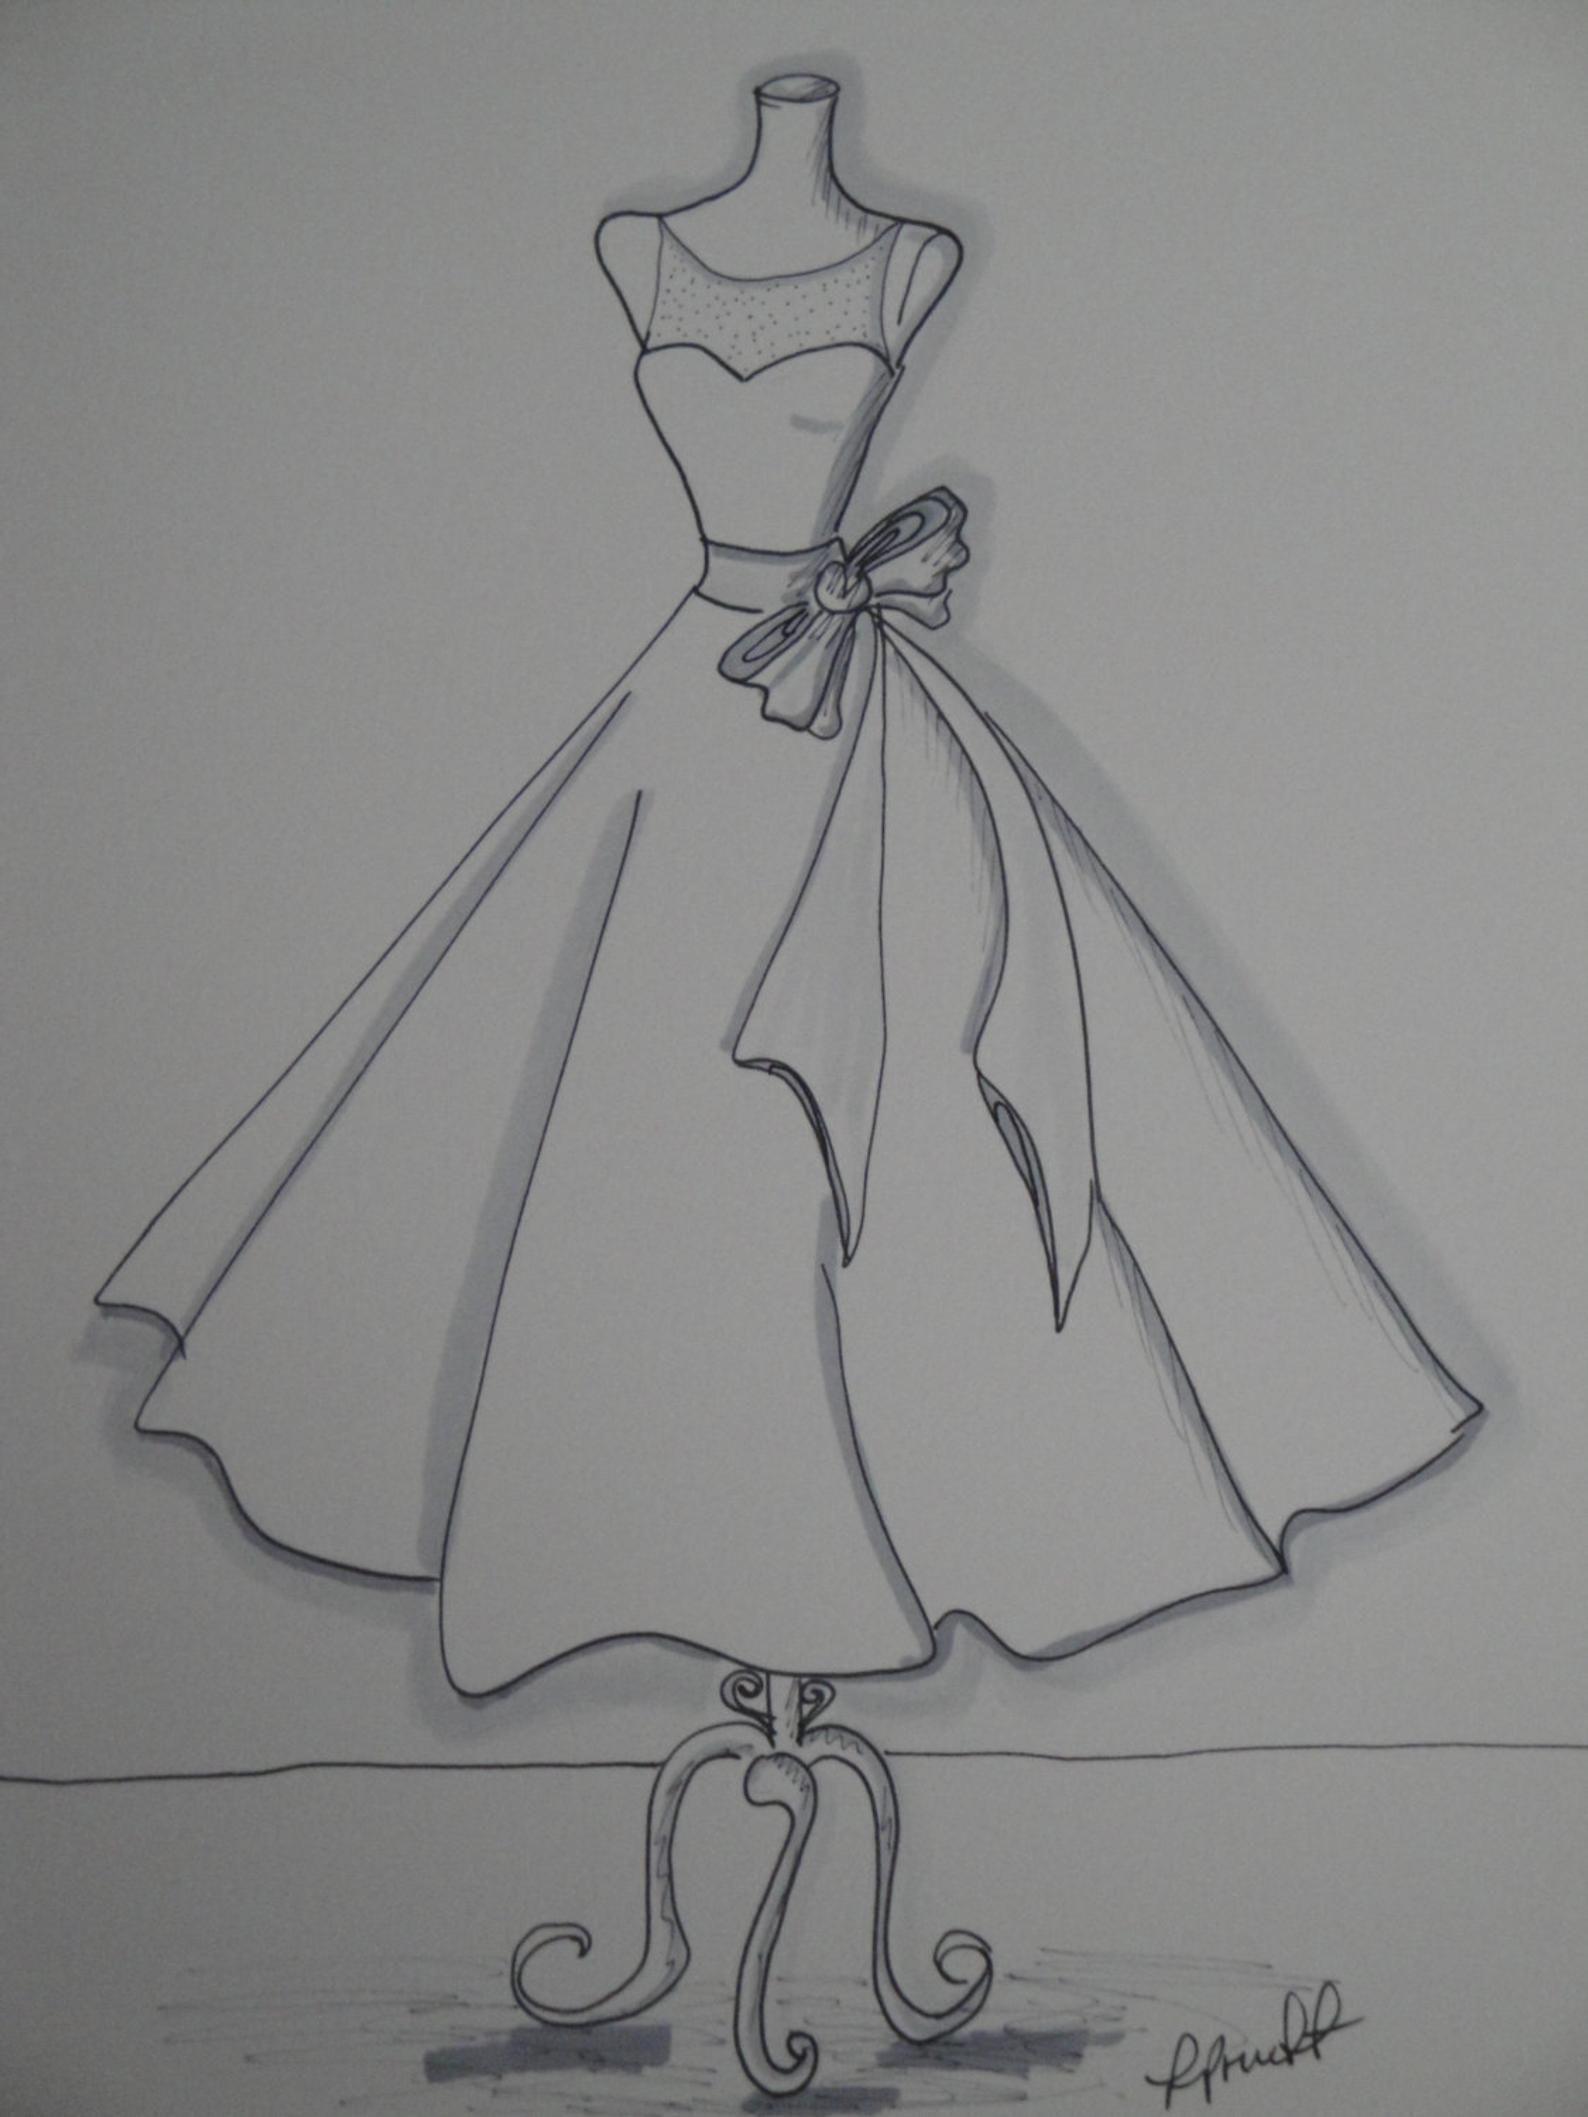 Vestidos Faciles Bocetos Vestidos Bocetos Faciles Vestidos Bocetos Vest Cuaderno De Bocetos De Moda Dibujos De Diseno De Moda Diseno De Modas Dibujos